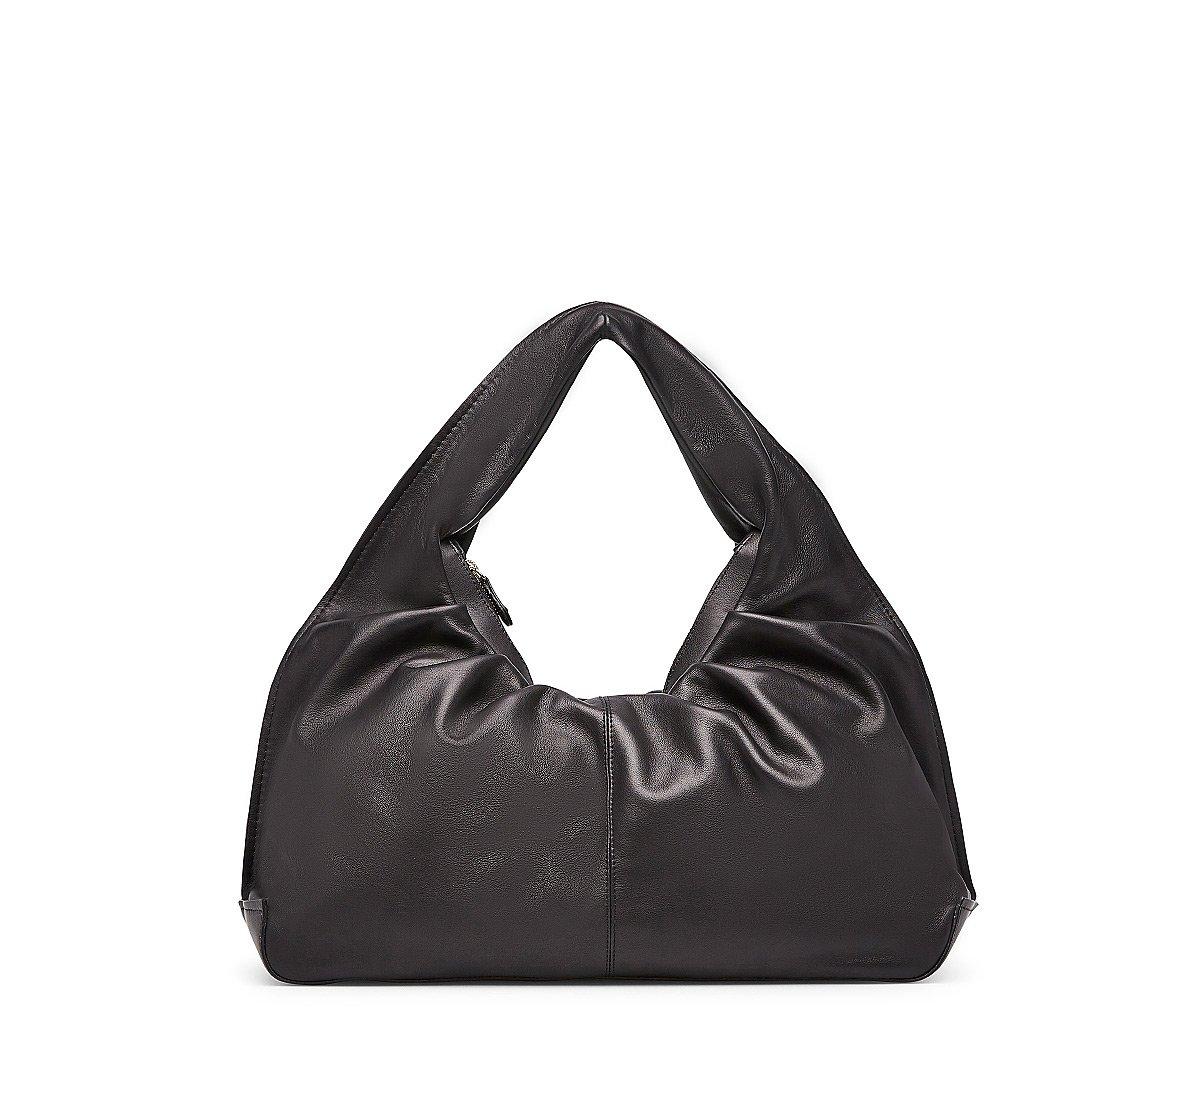 Soft leather bag